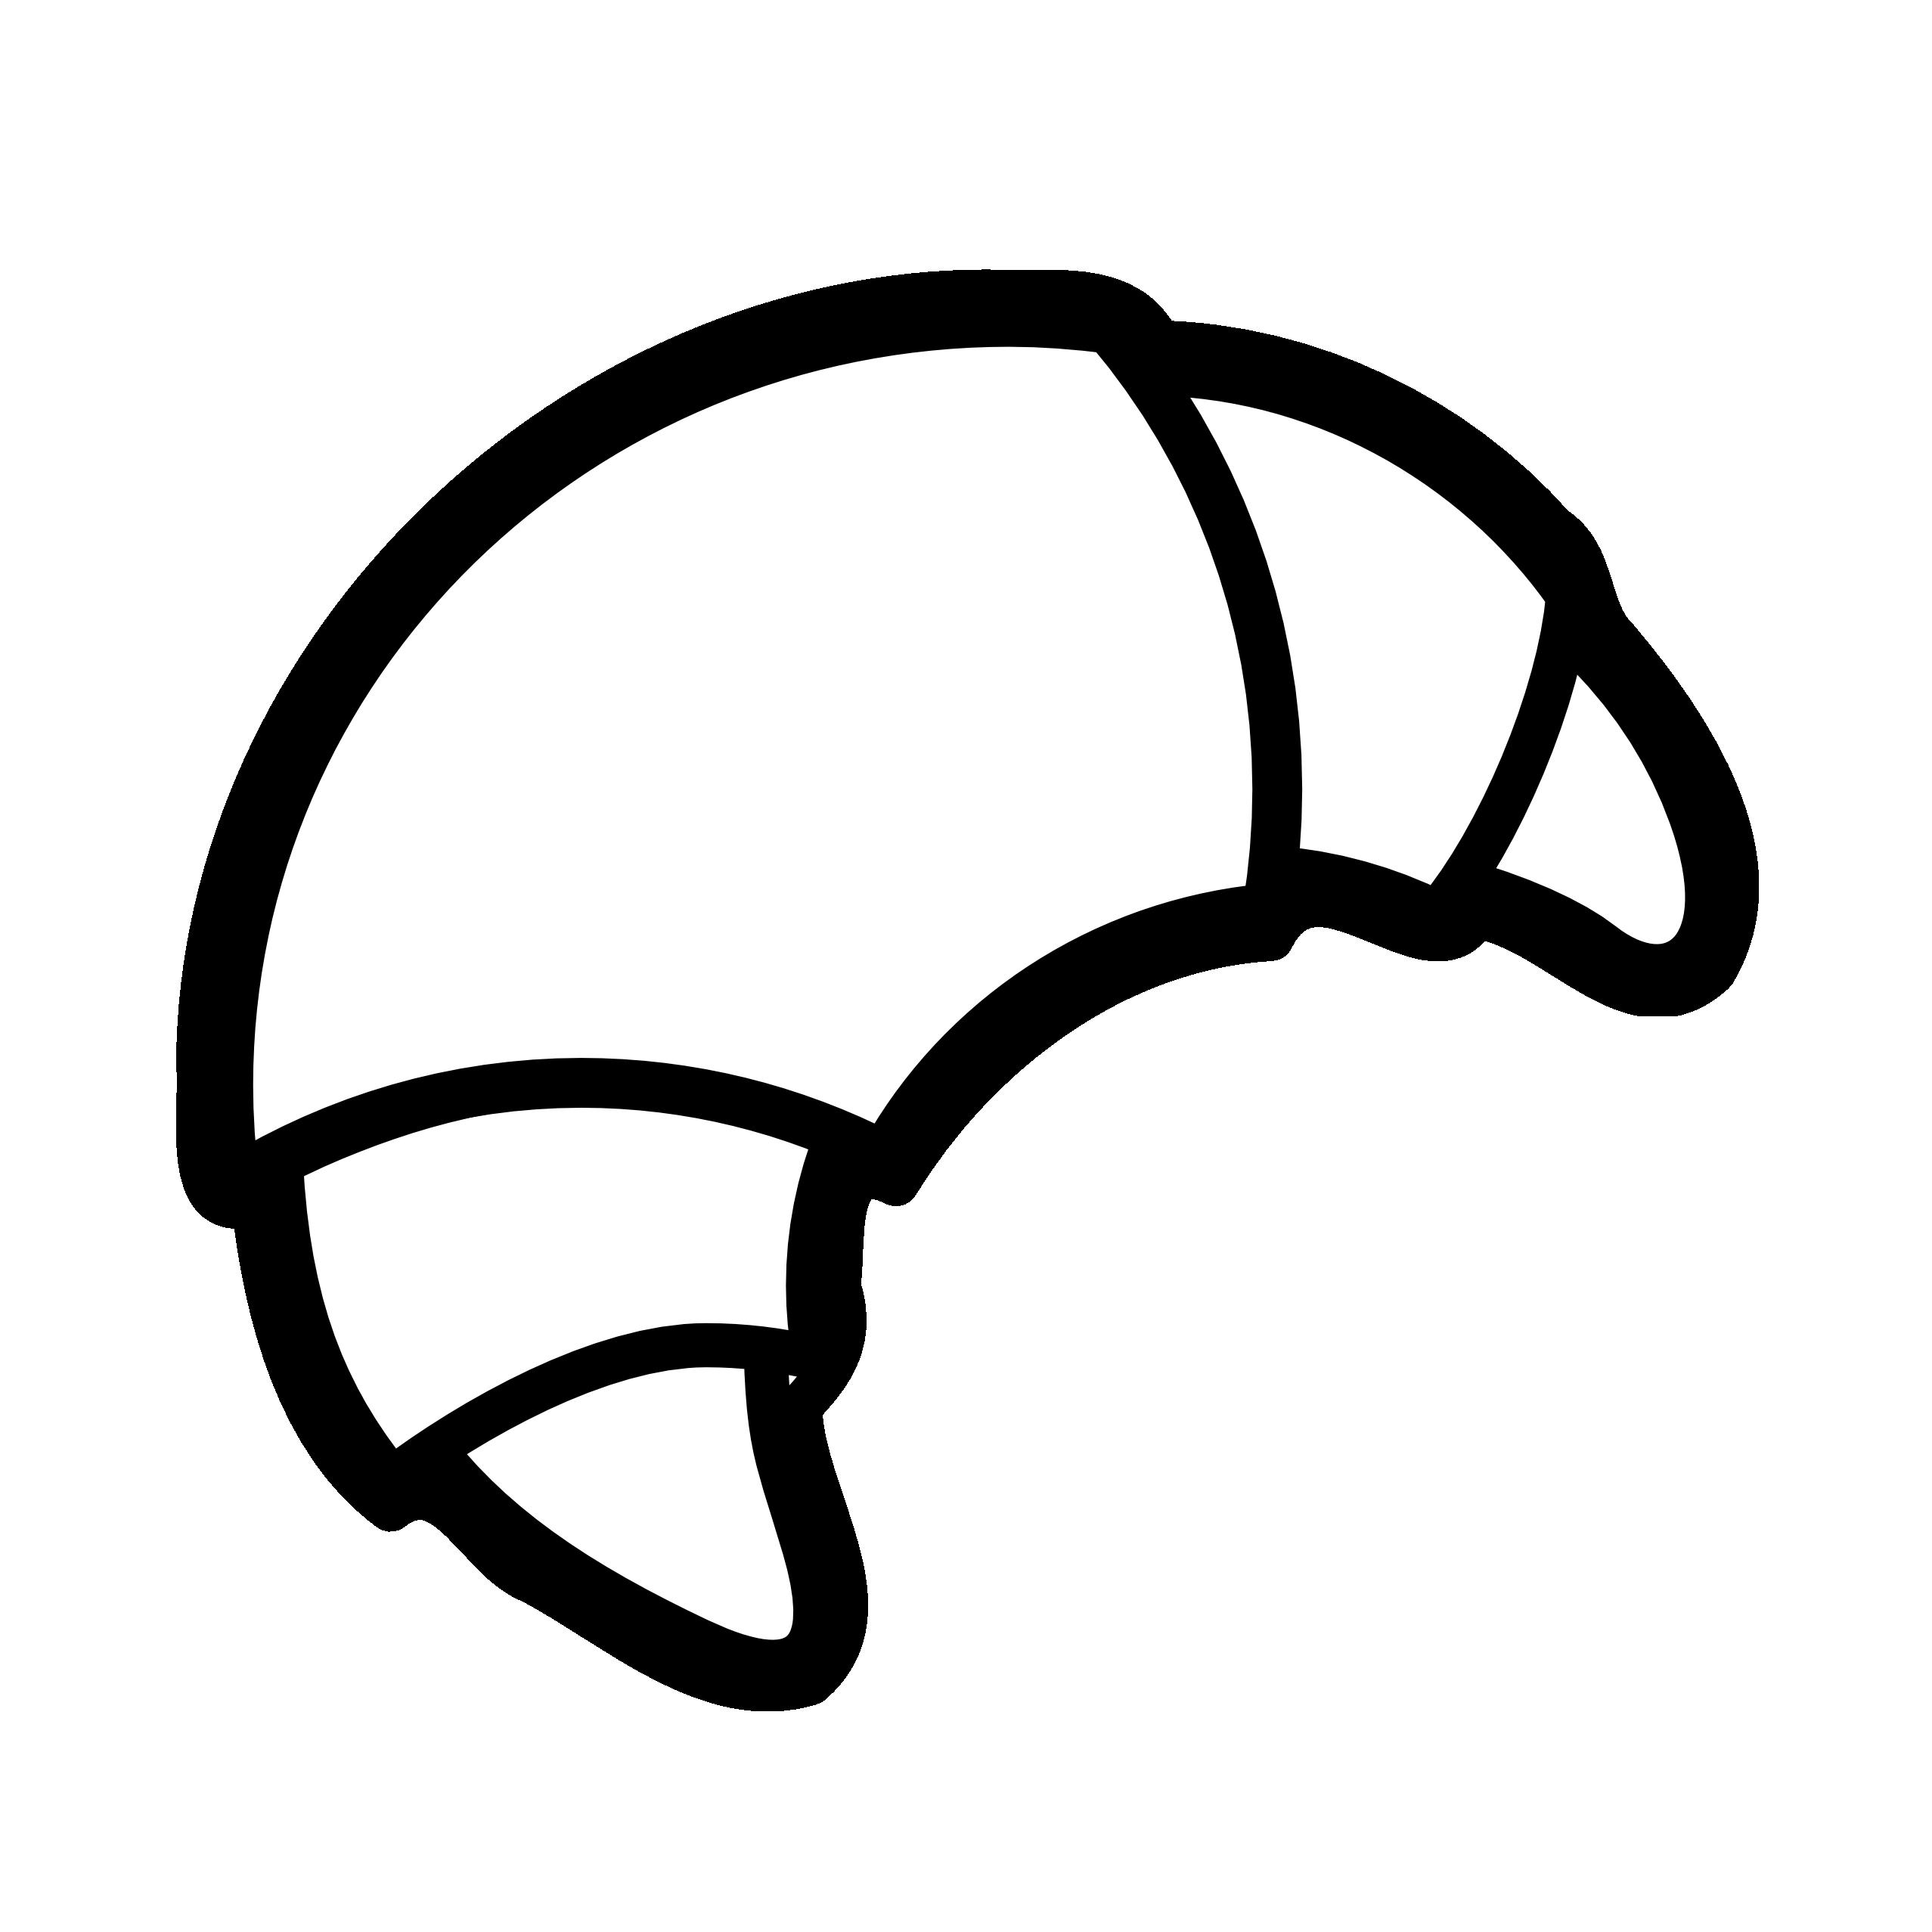 Bakery Croissant Black White Line Art Scalable Vector Graphics Svg